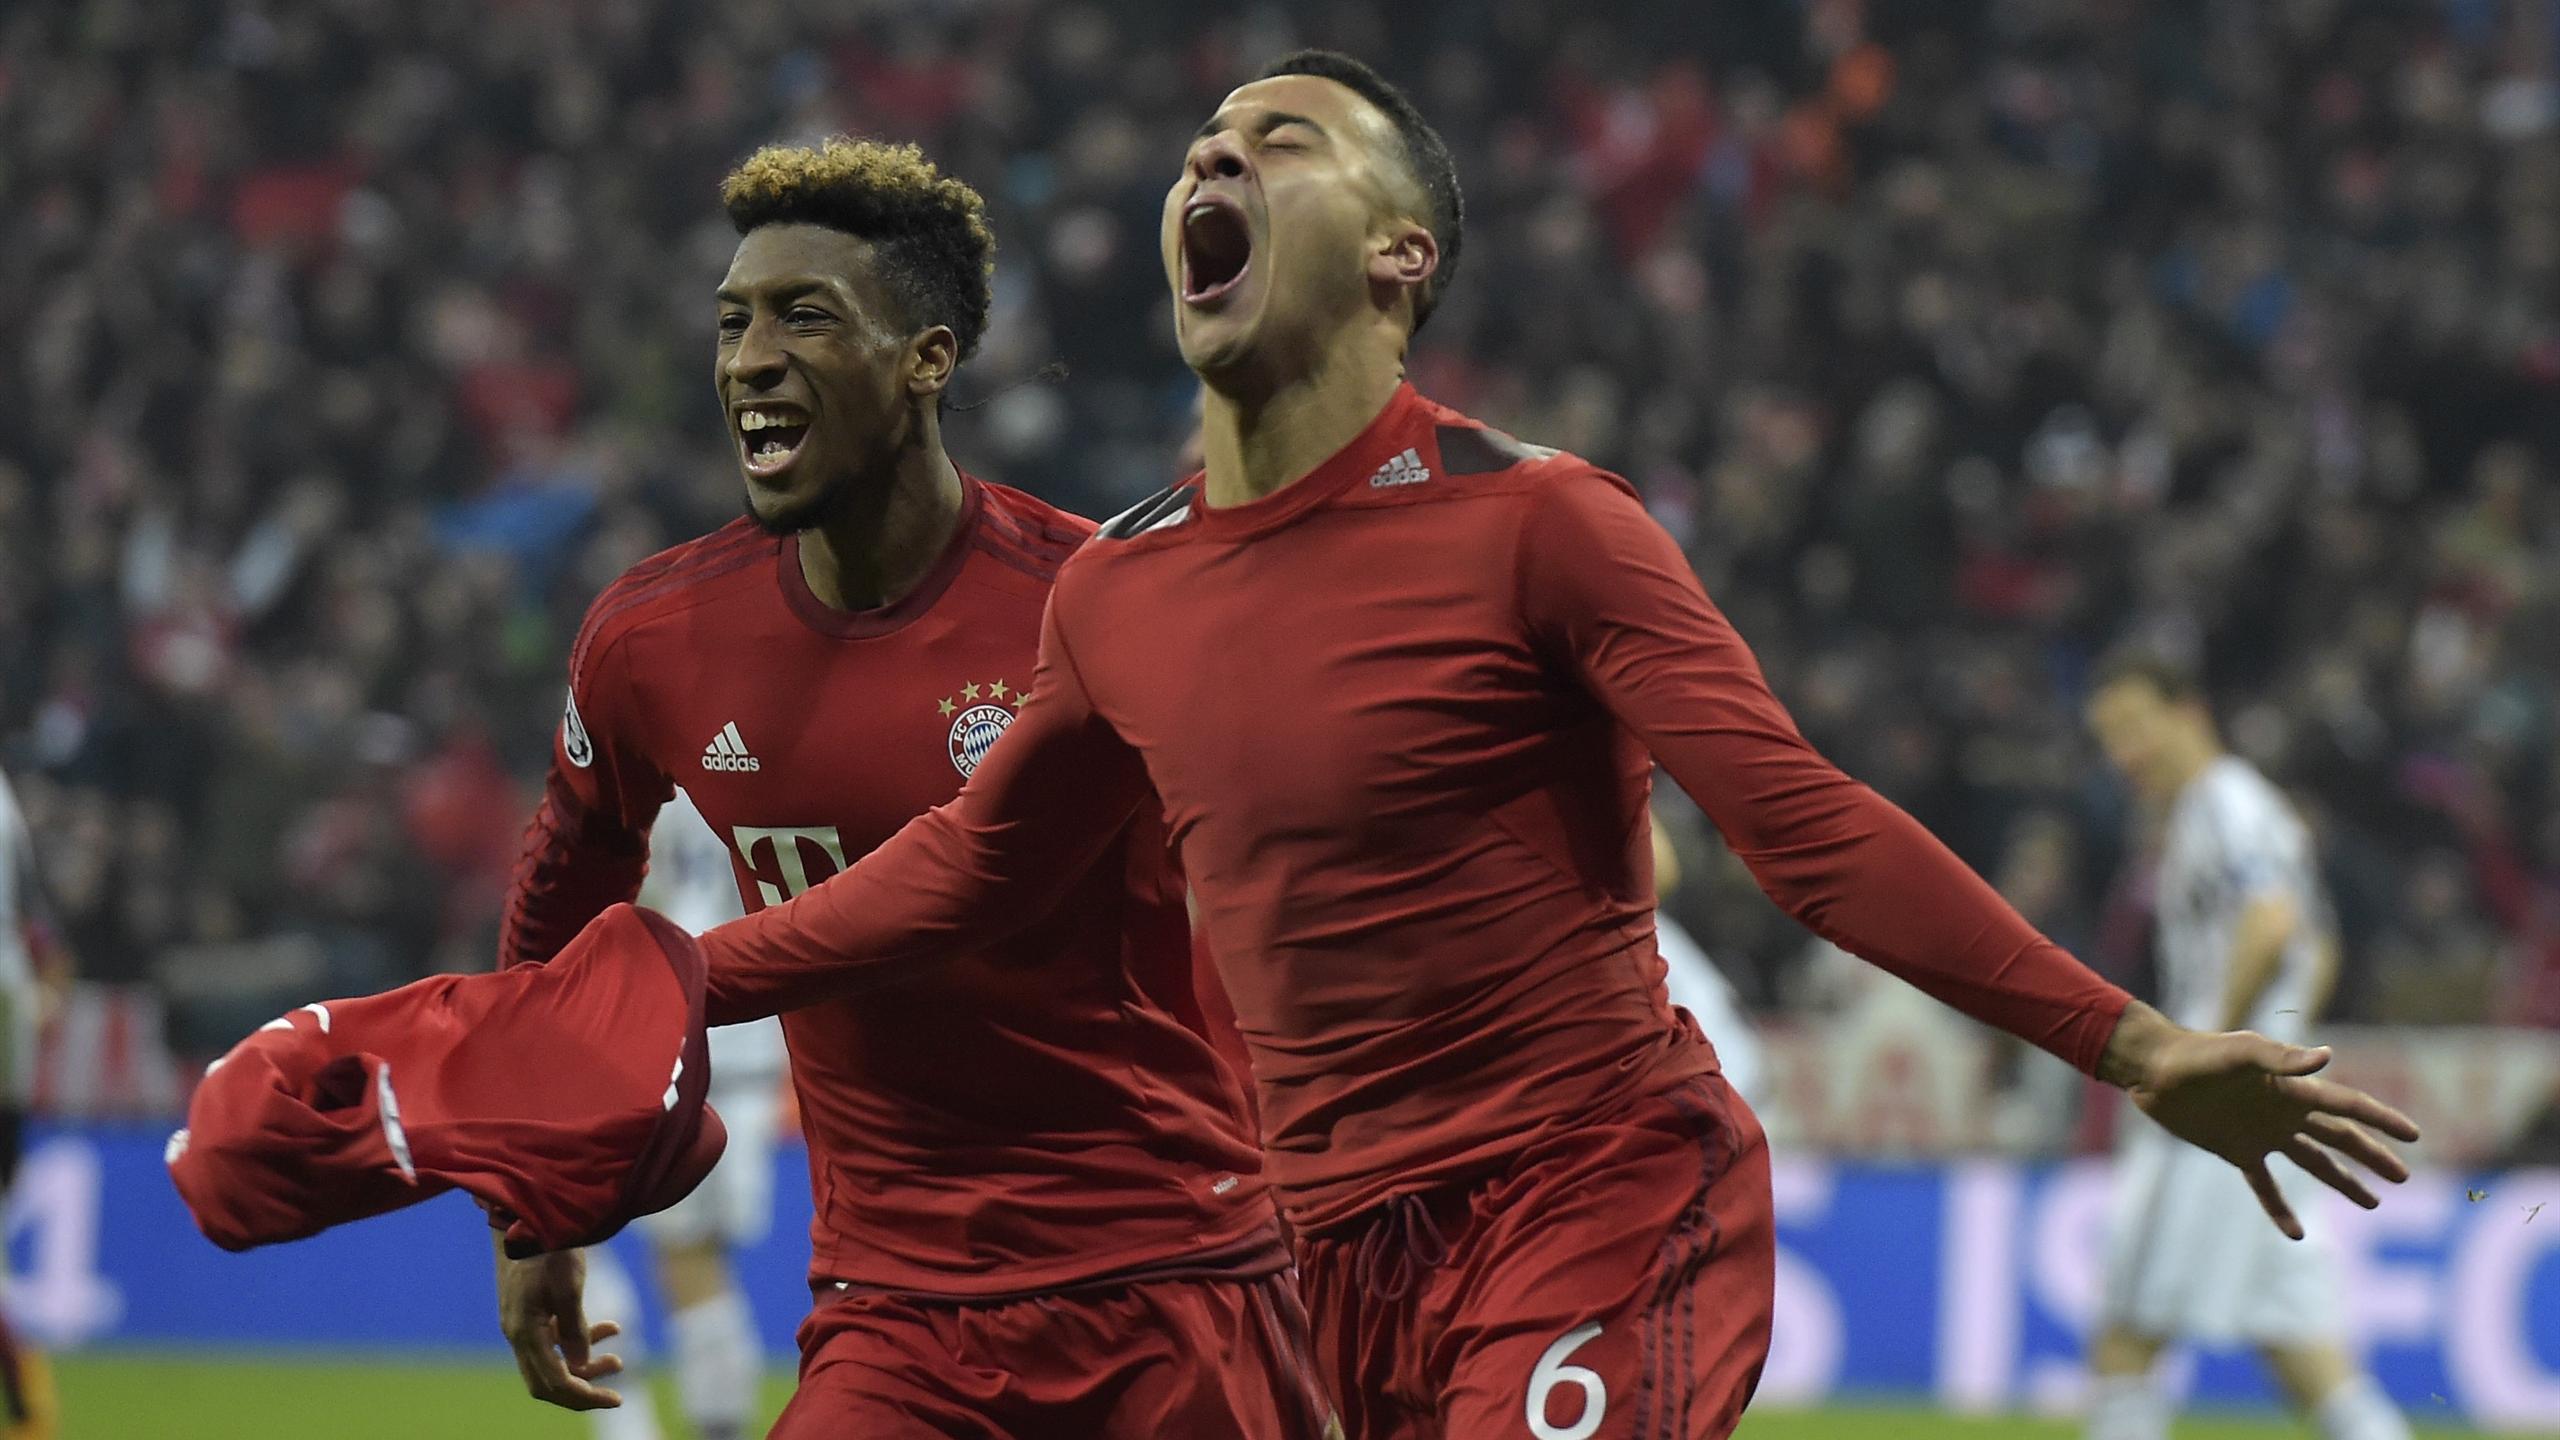 Coman, Thiago - Bayern v Juventus - Champions League 2016